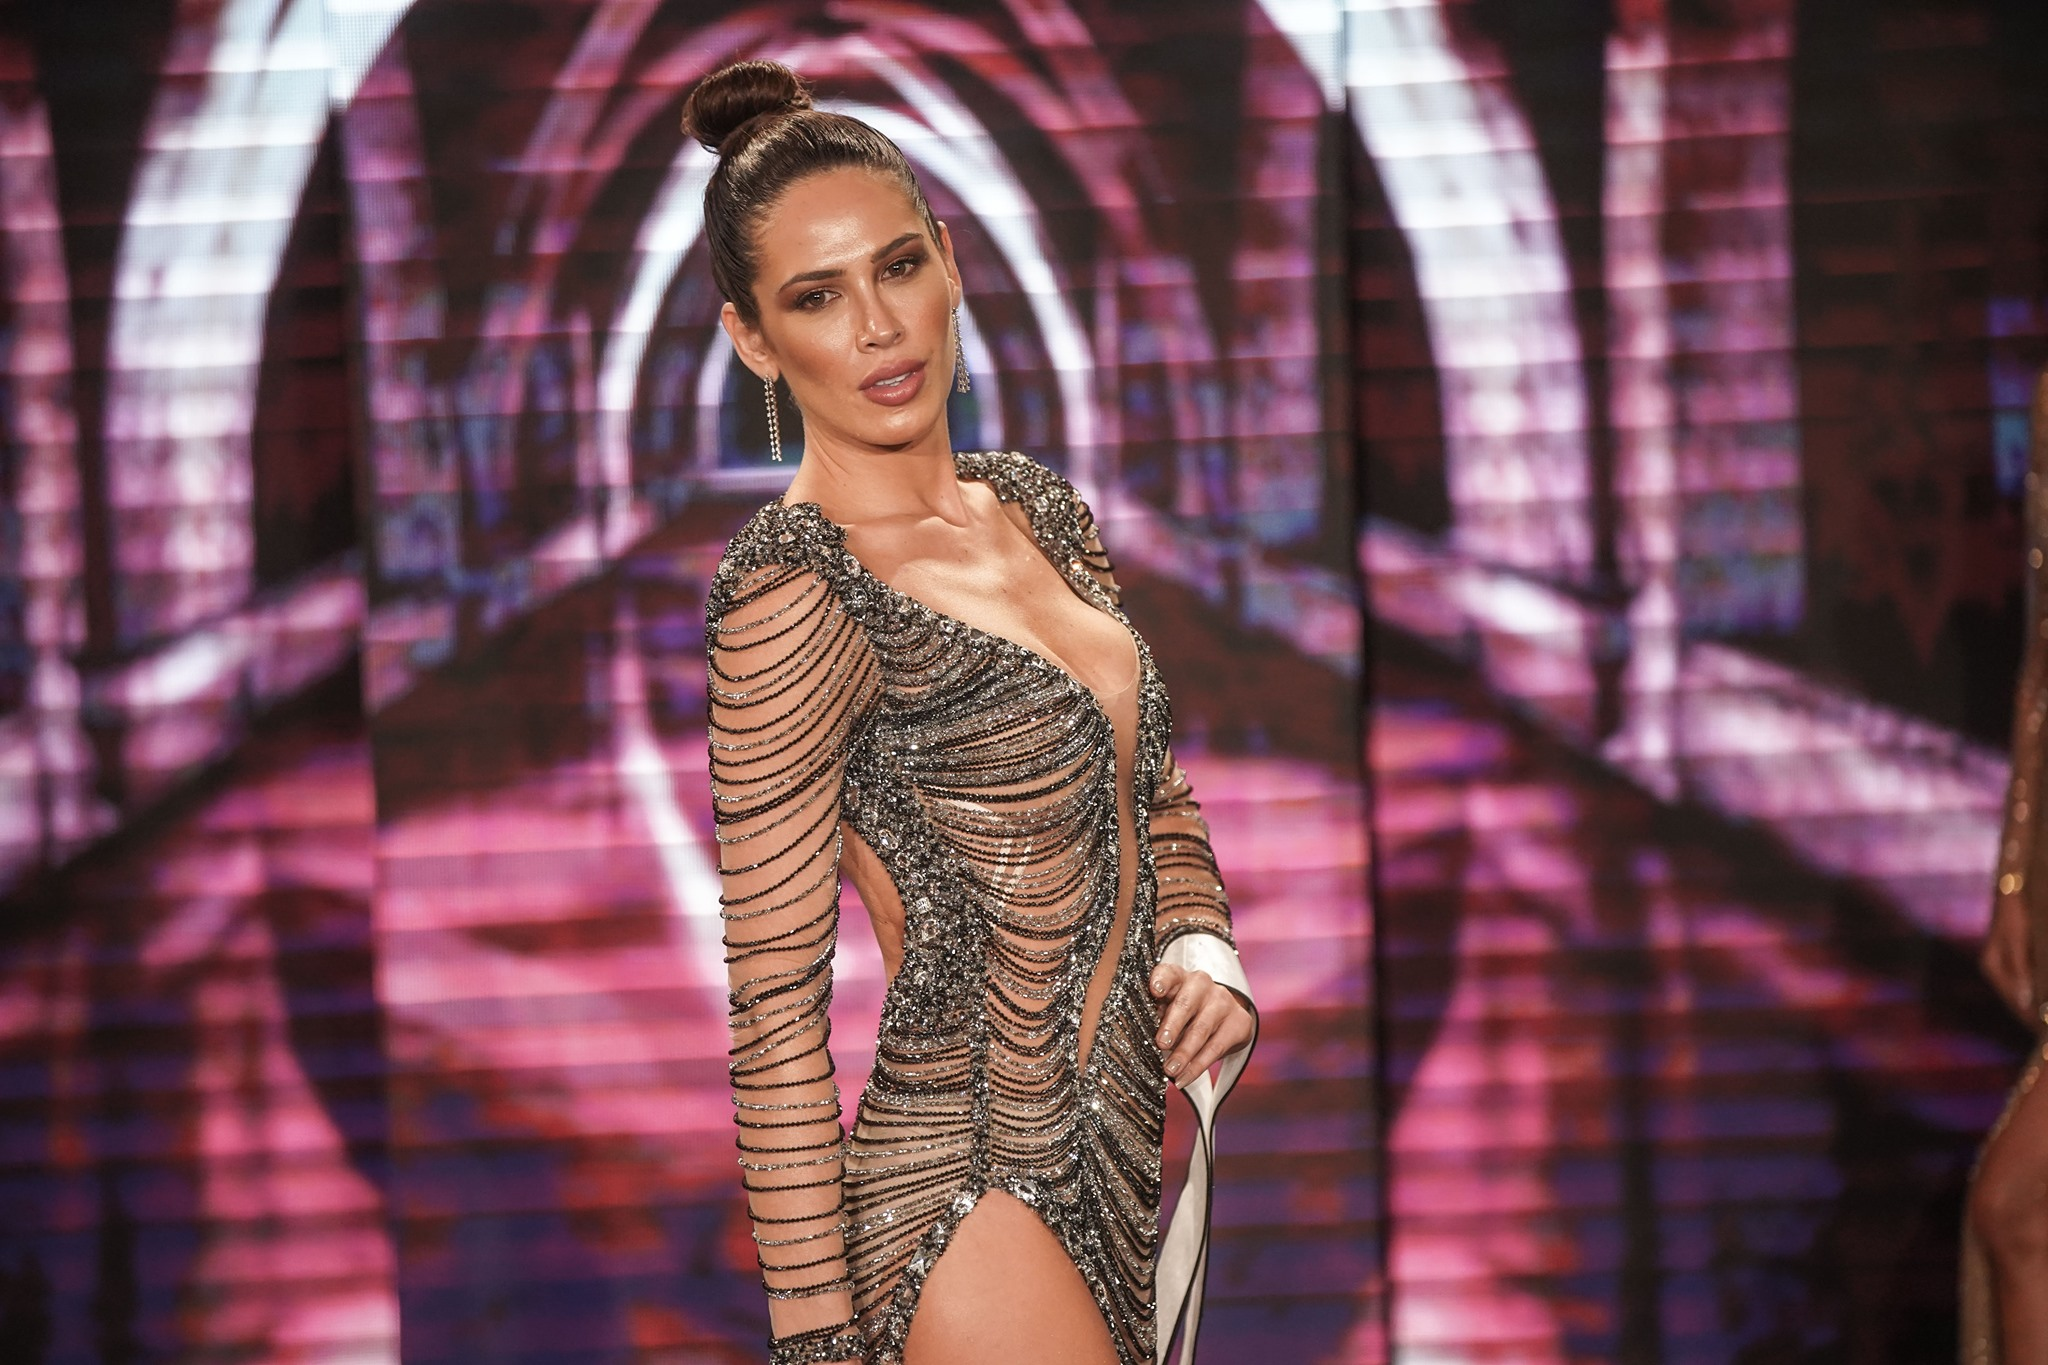 bruna zanardo, 1st runner-up de miss supranational brazil 2020/miss brasil internacional 2017/miss brasil terra 2016. - Página 19 12844410